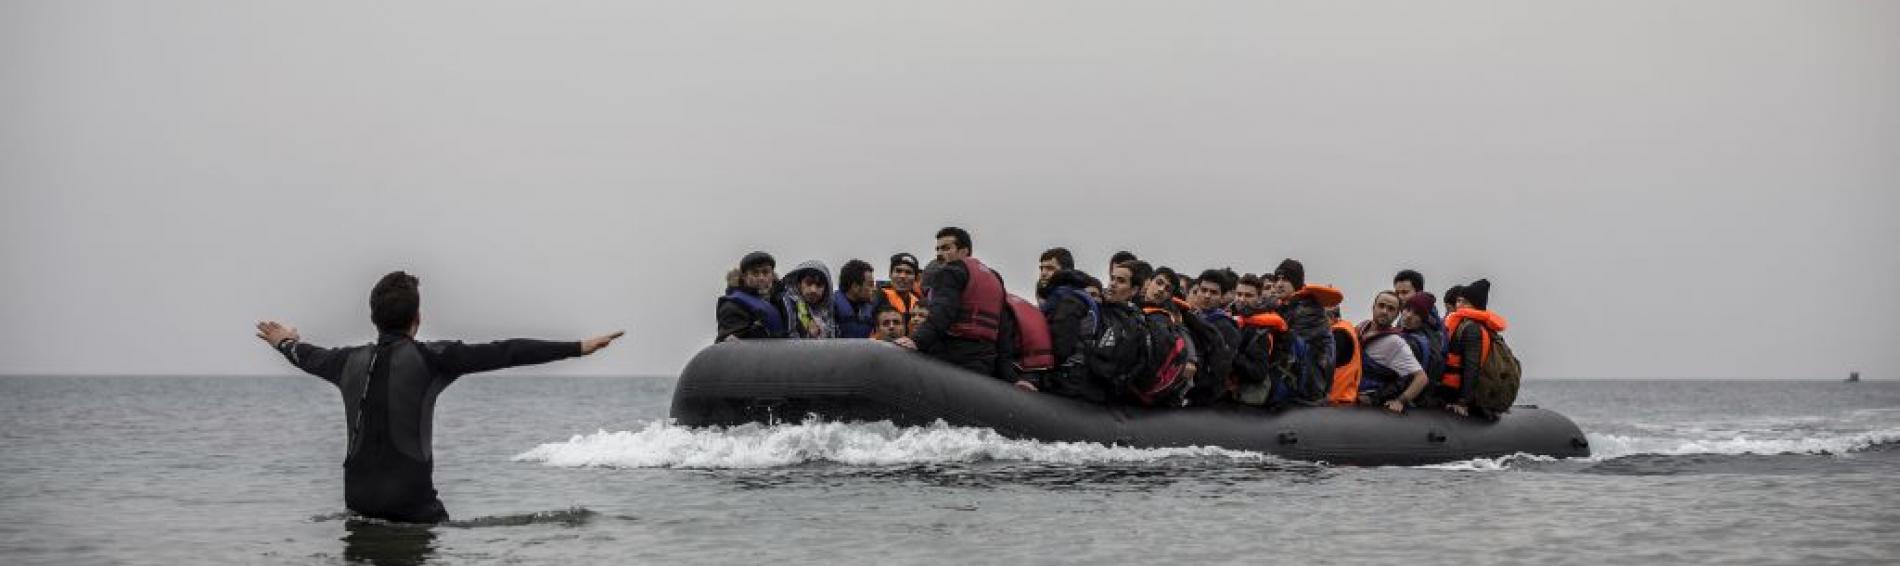 Lesbos 3 - MdM España